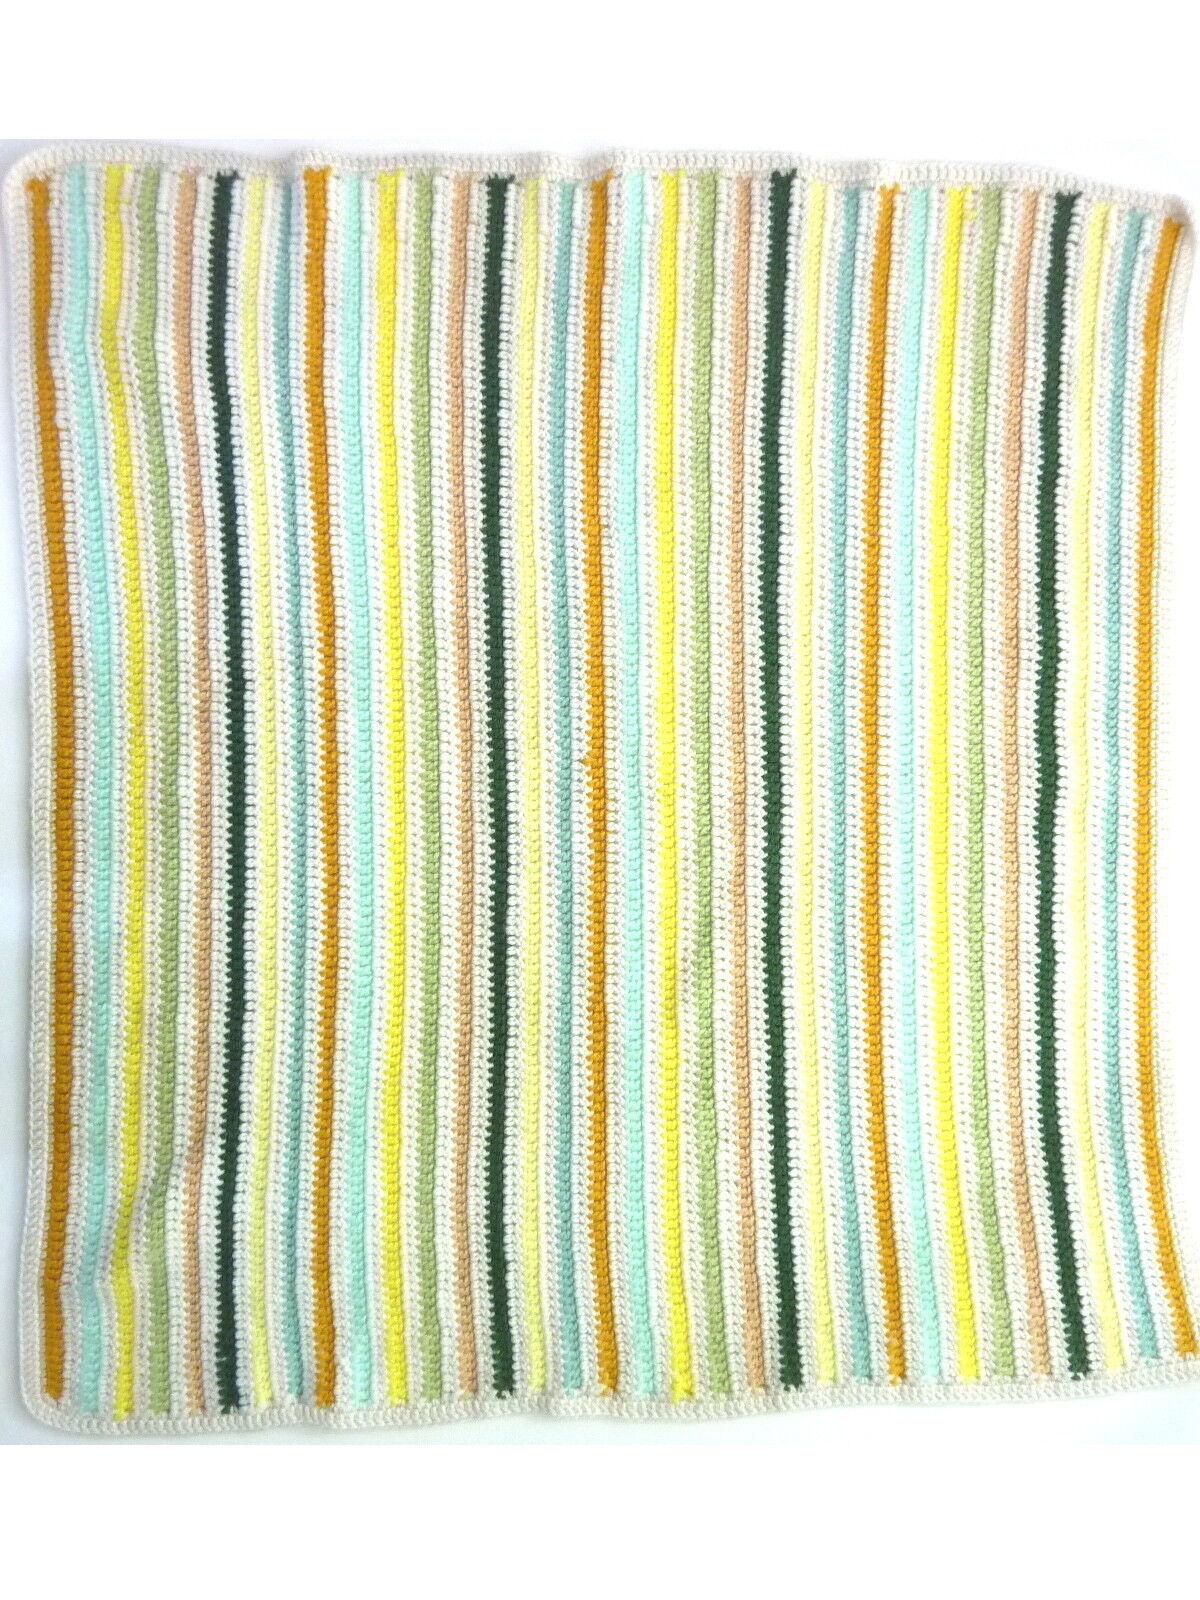 Granny Knit Crochet Small Baby Stoller Blanket 35  x 32  Beige bluee Green Stripe